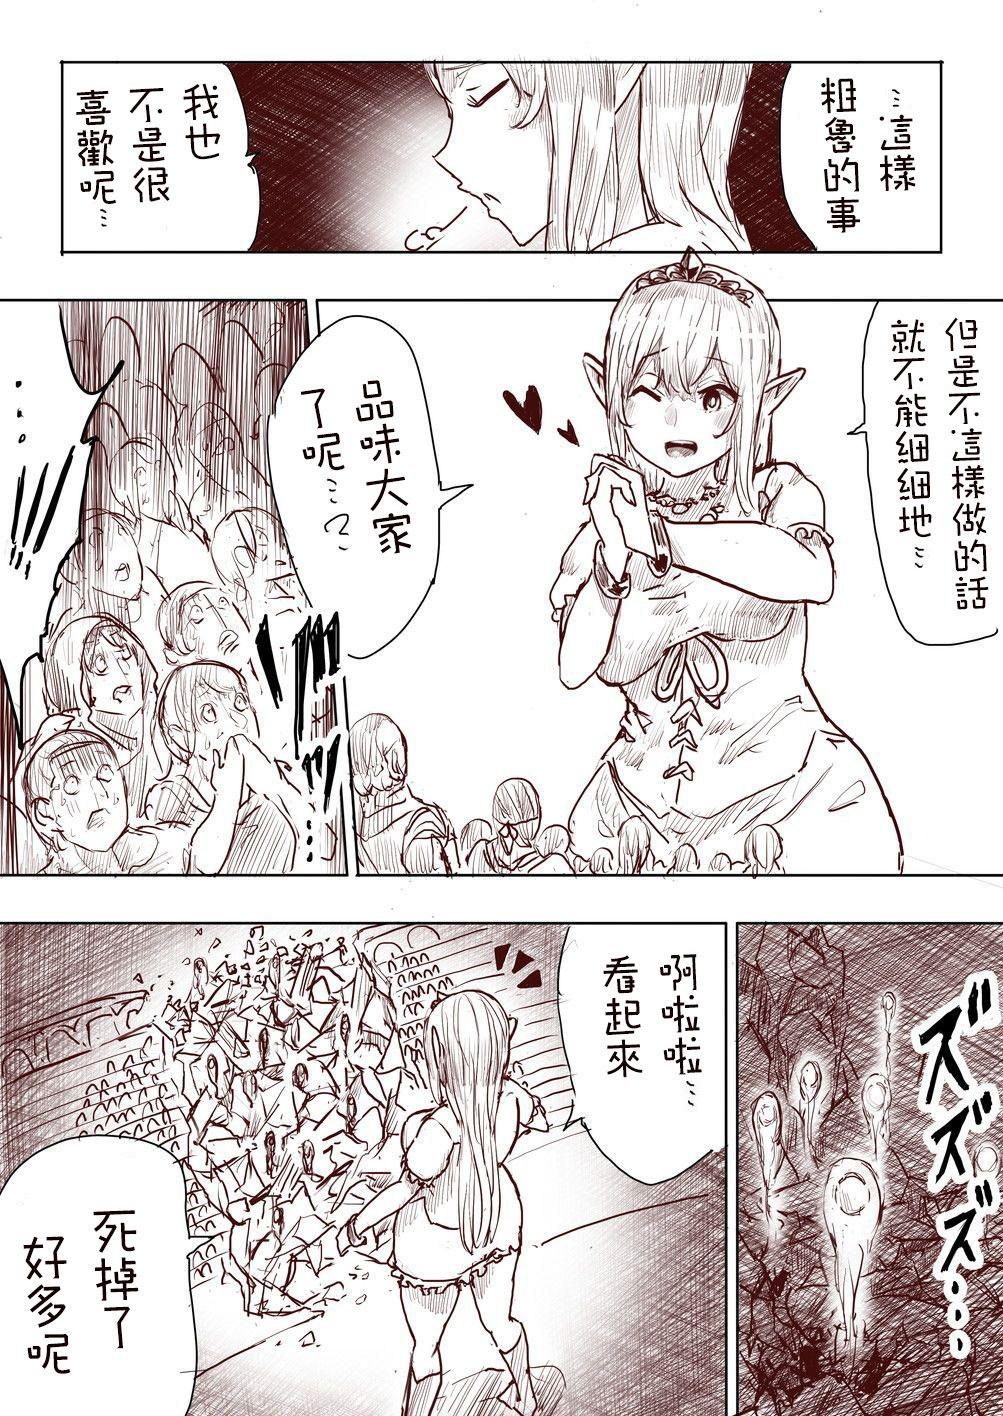 Elf Princess Strikes Back Part1 108